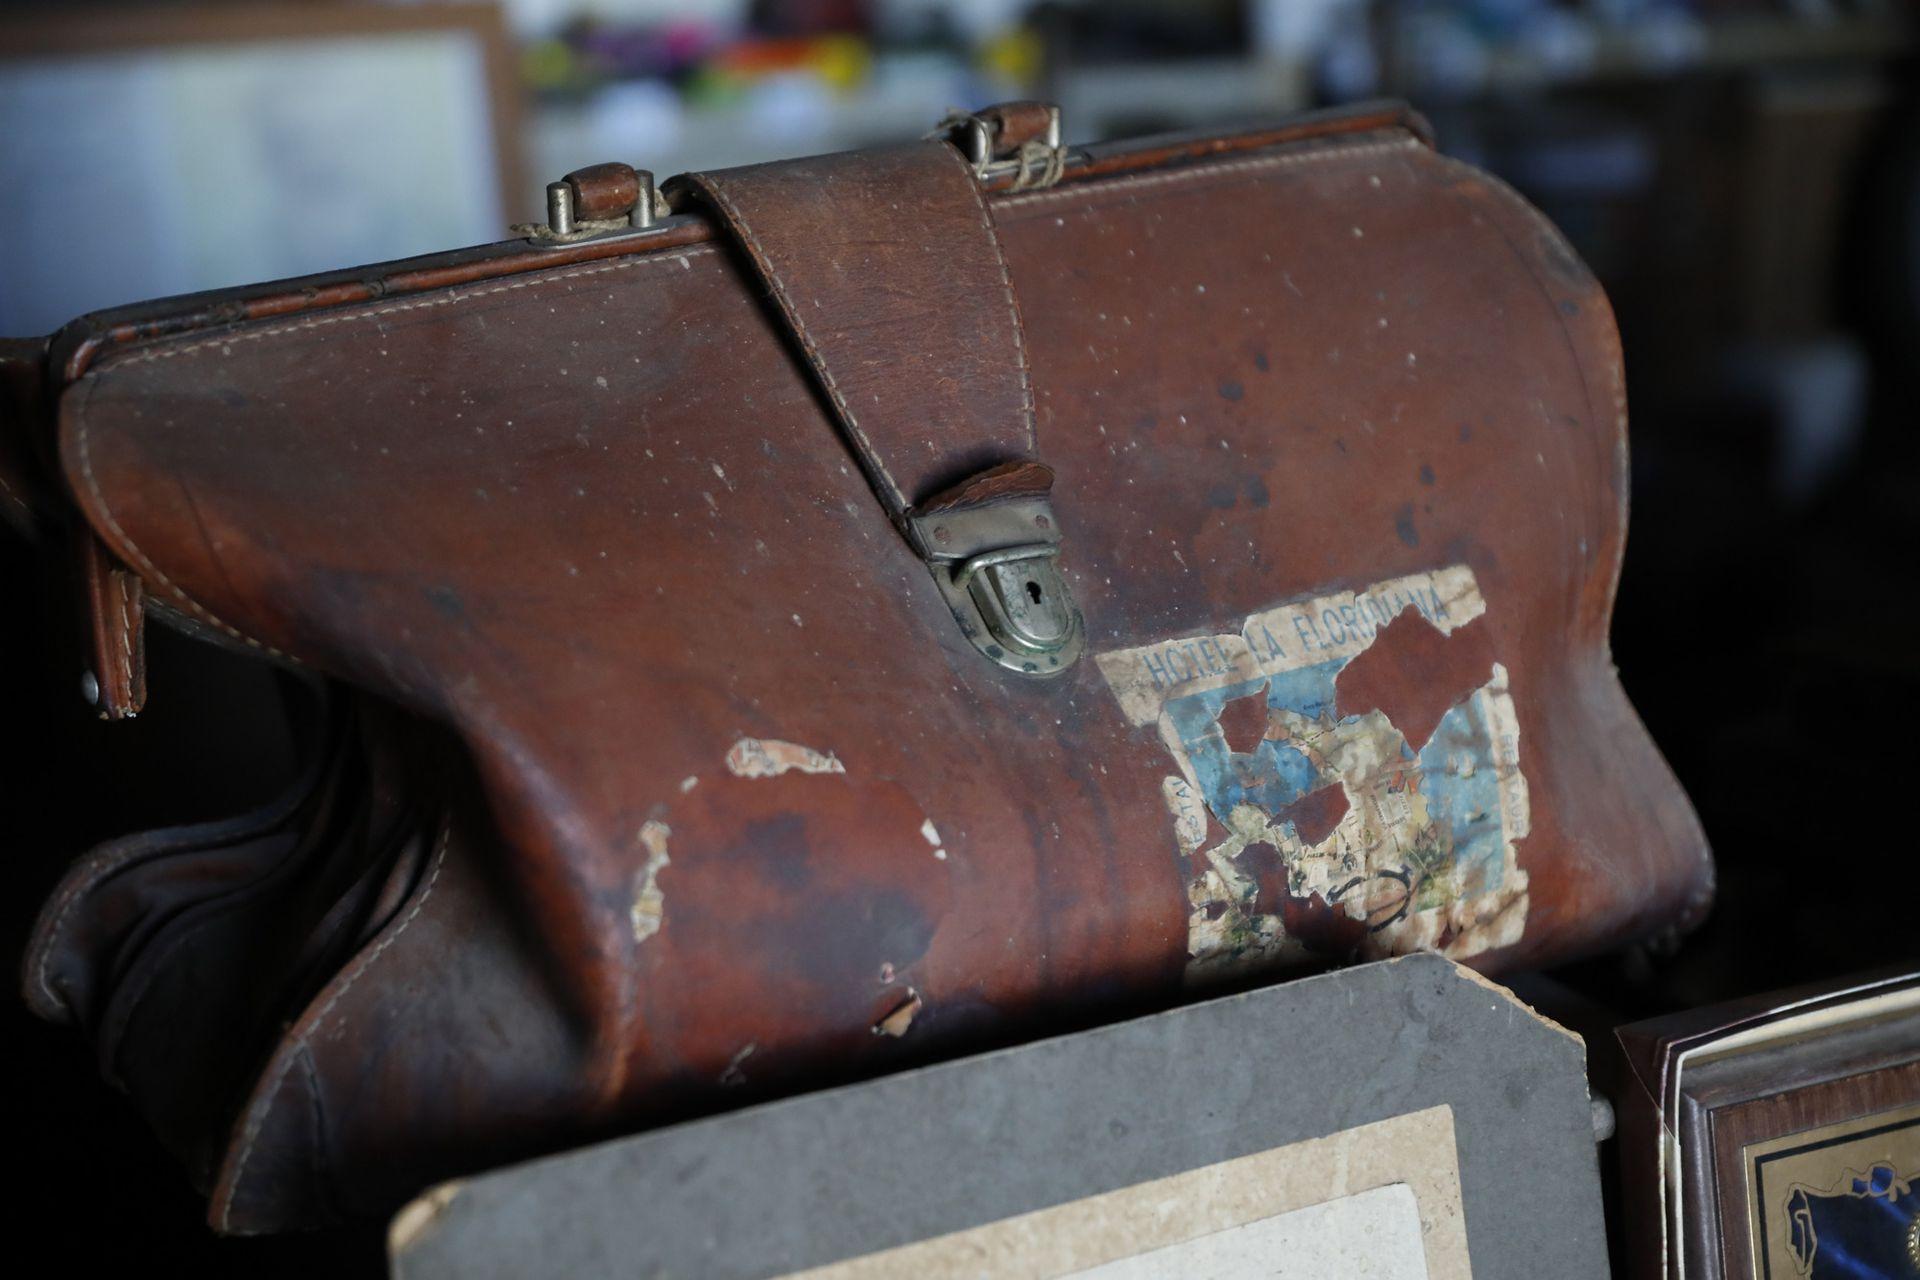 Un maletín, recuerdo de algún viaje